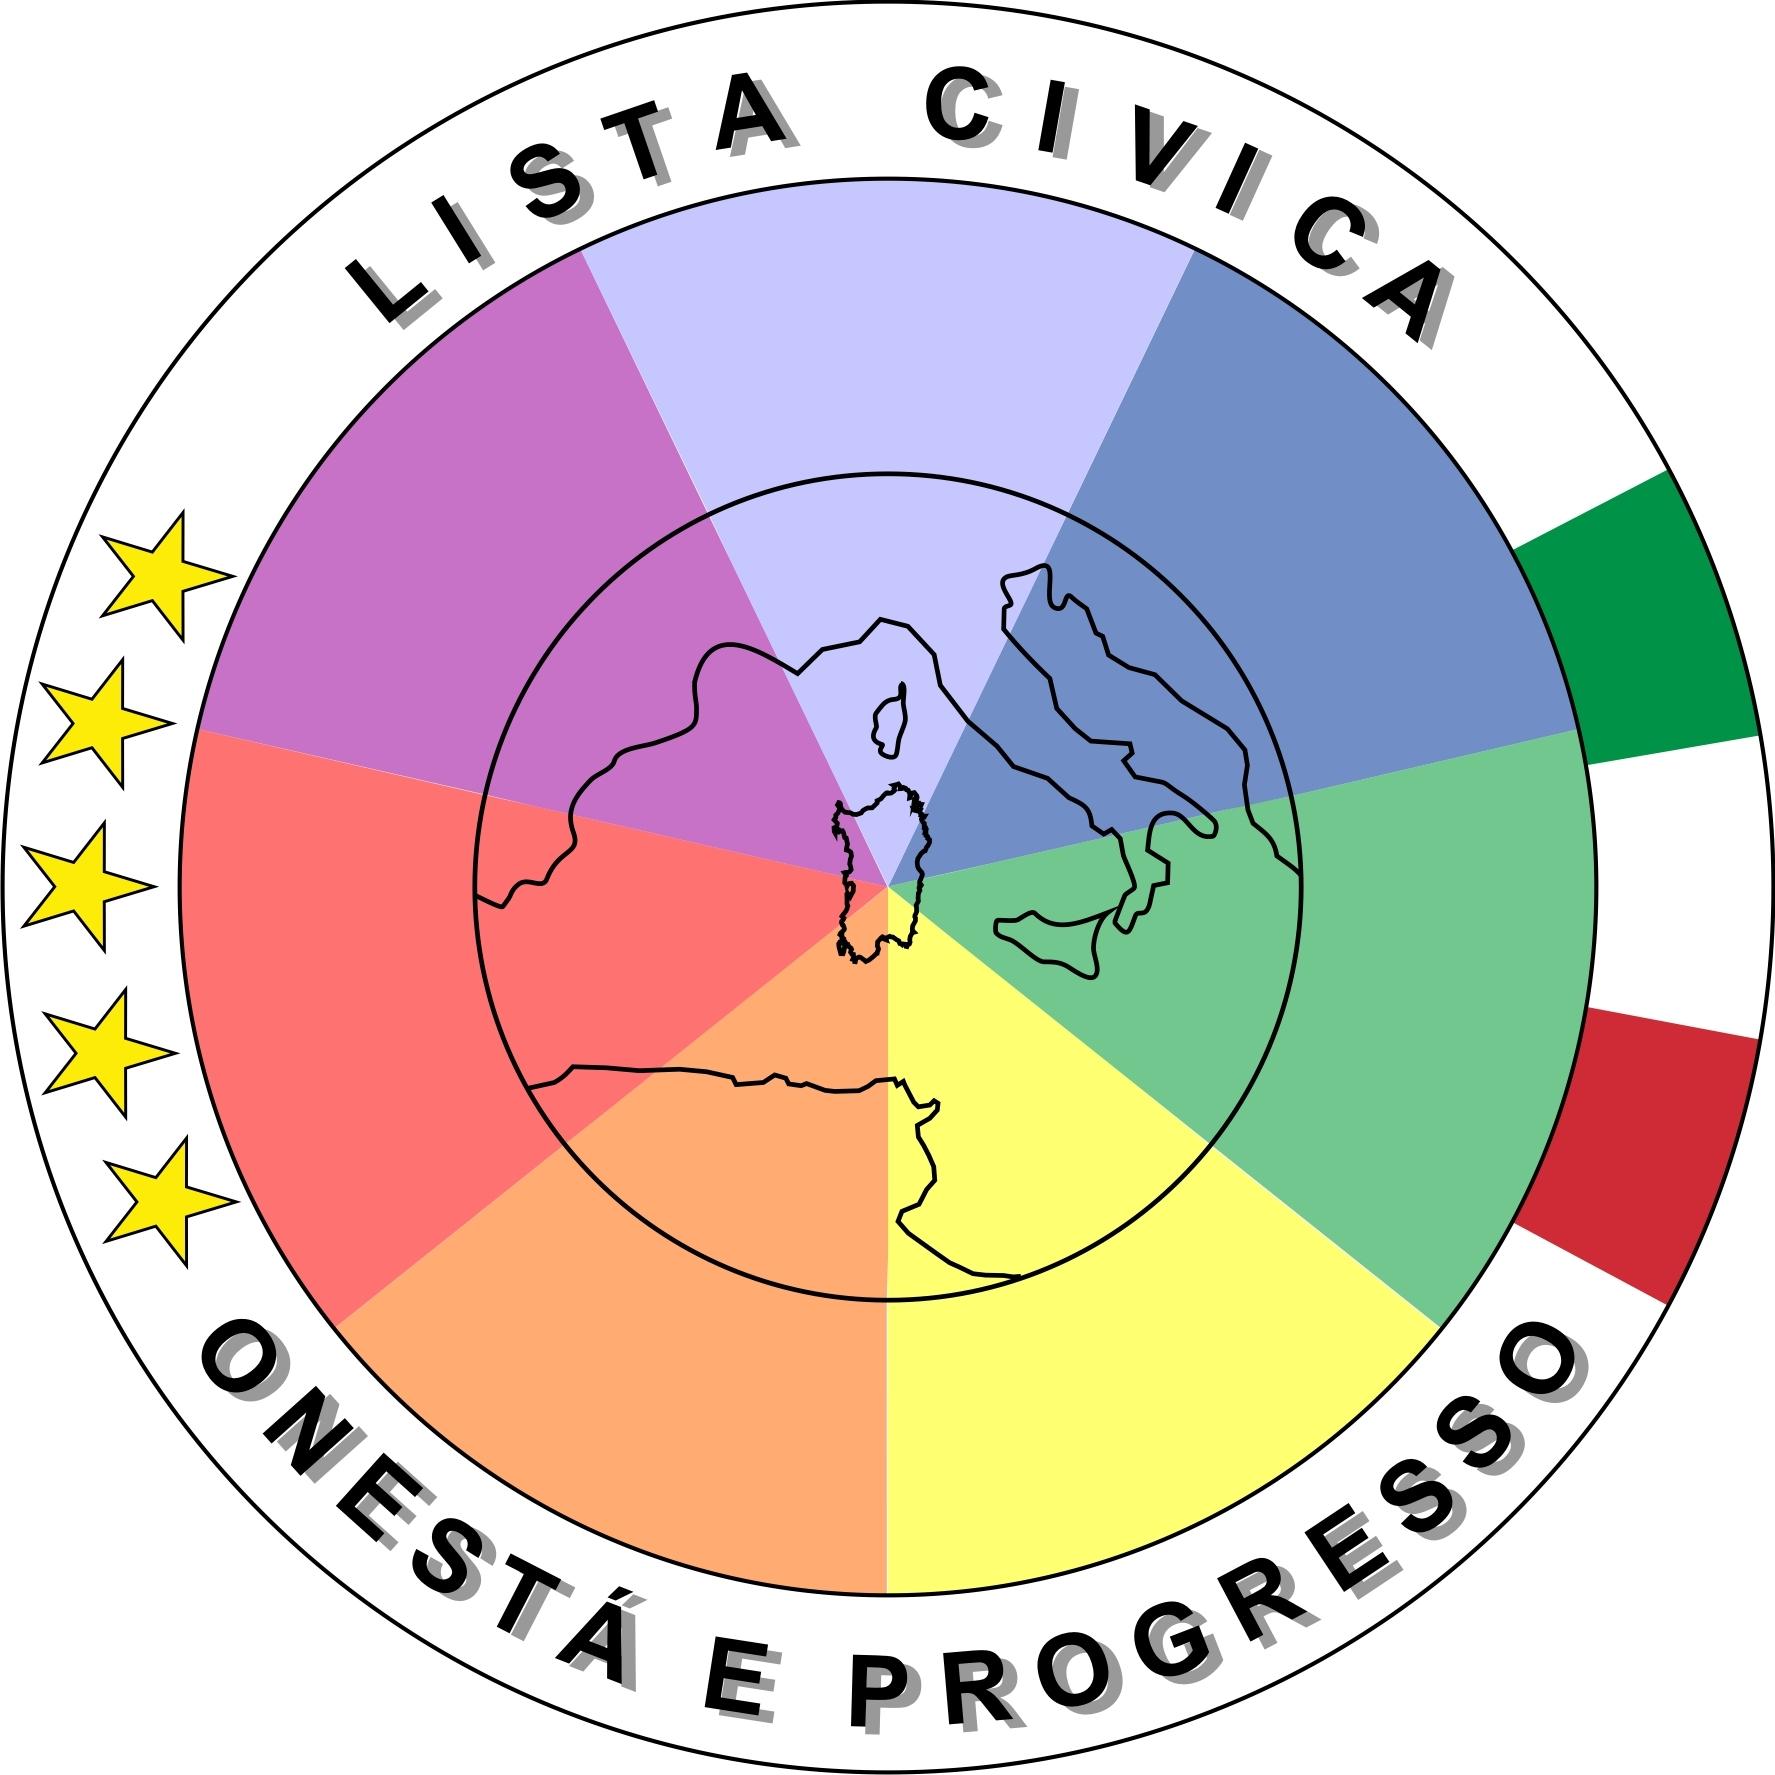 Lista Civica Iride Onesta e Progresso